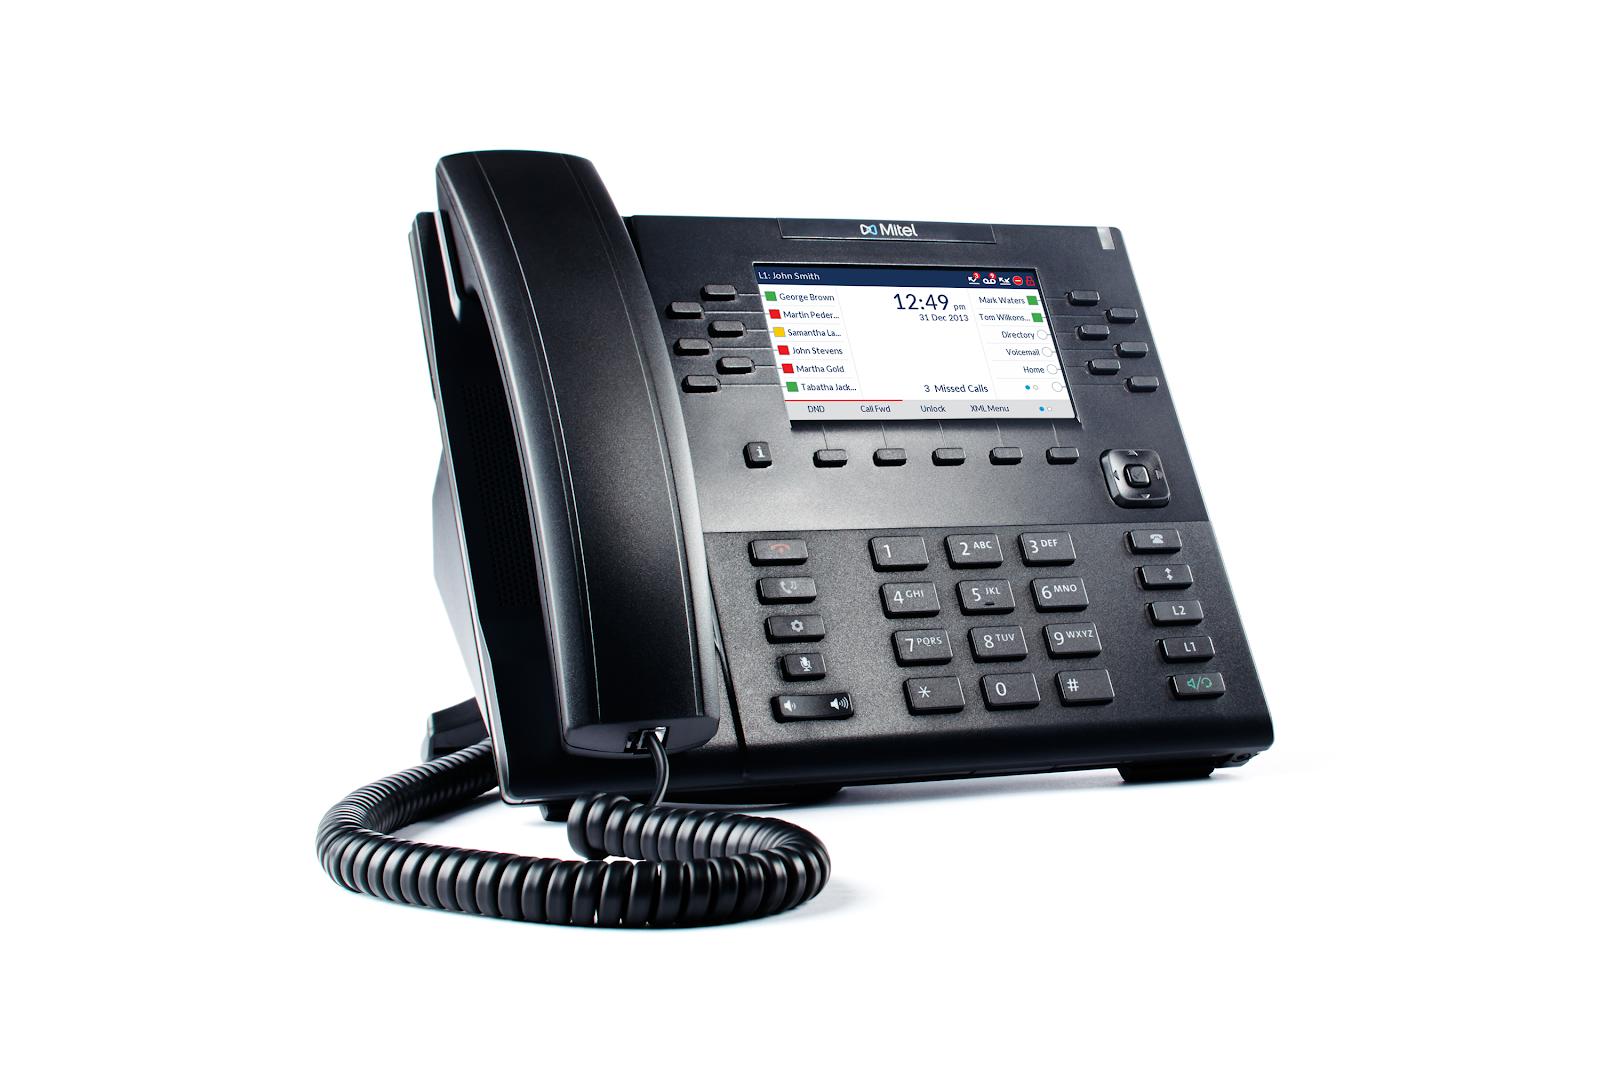 Mitel 6869 phone